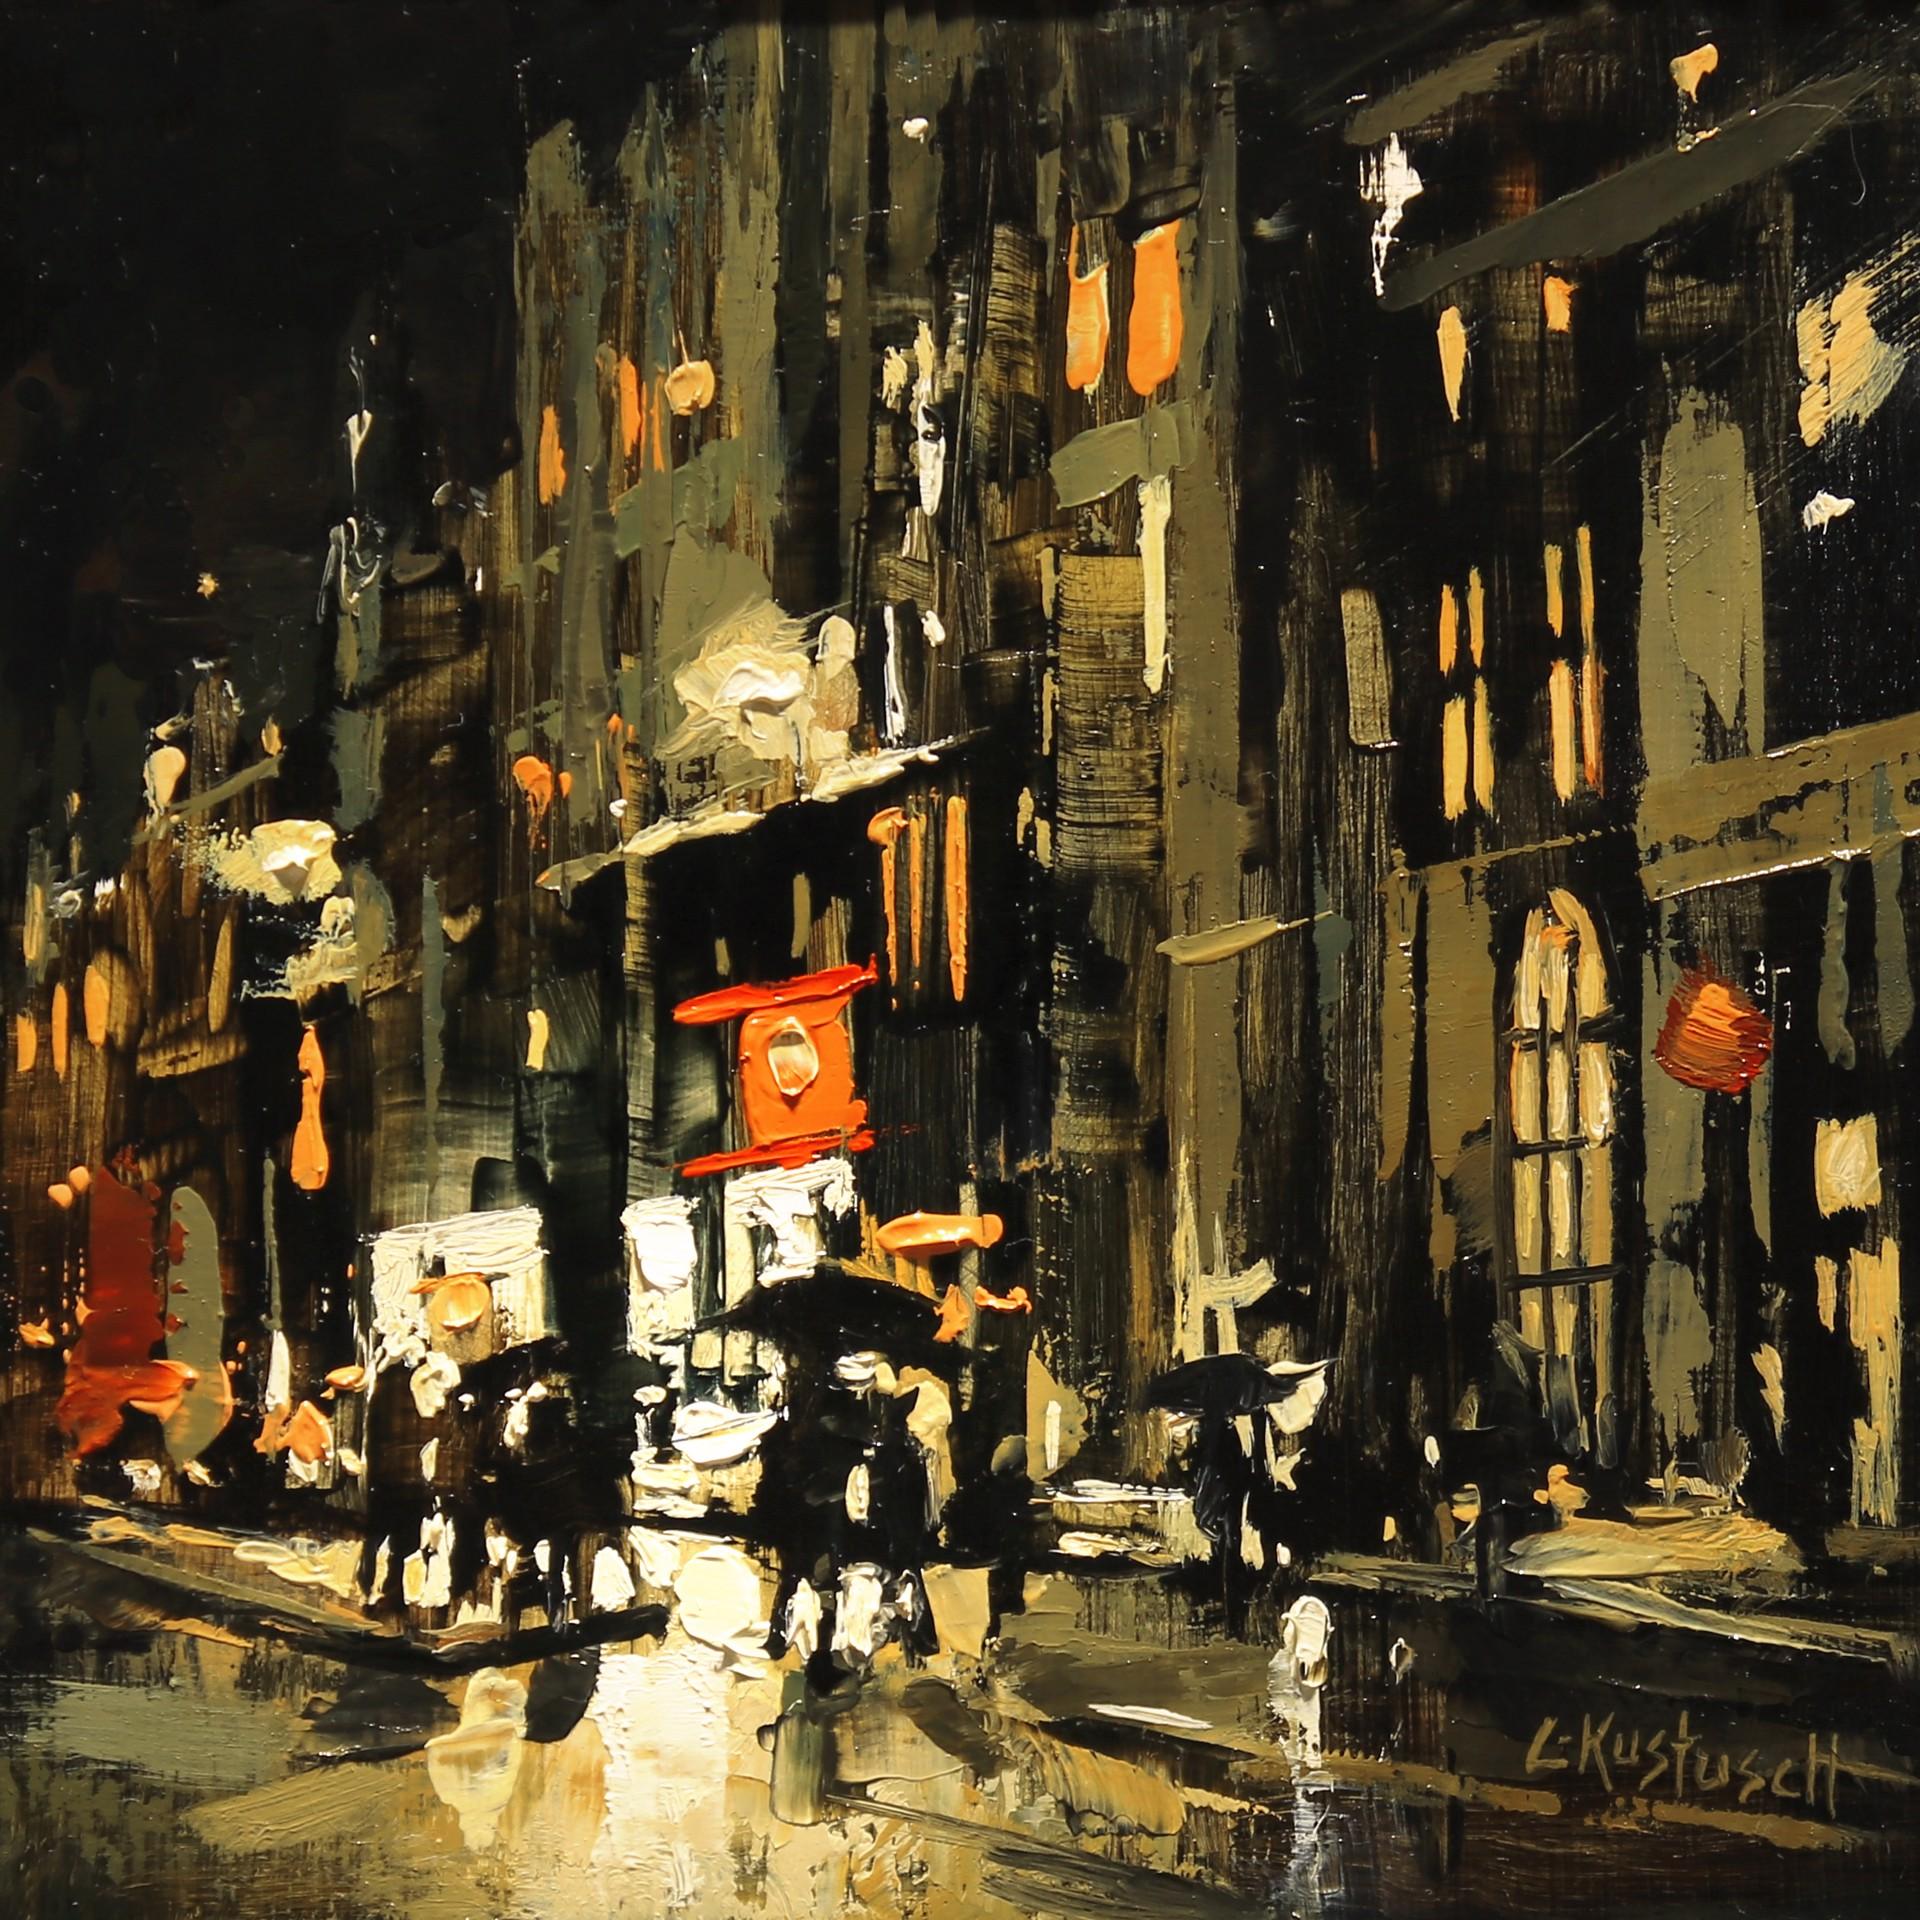 Covent Garden, London by Lindsey Kustusch